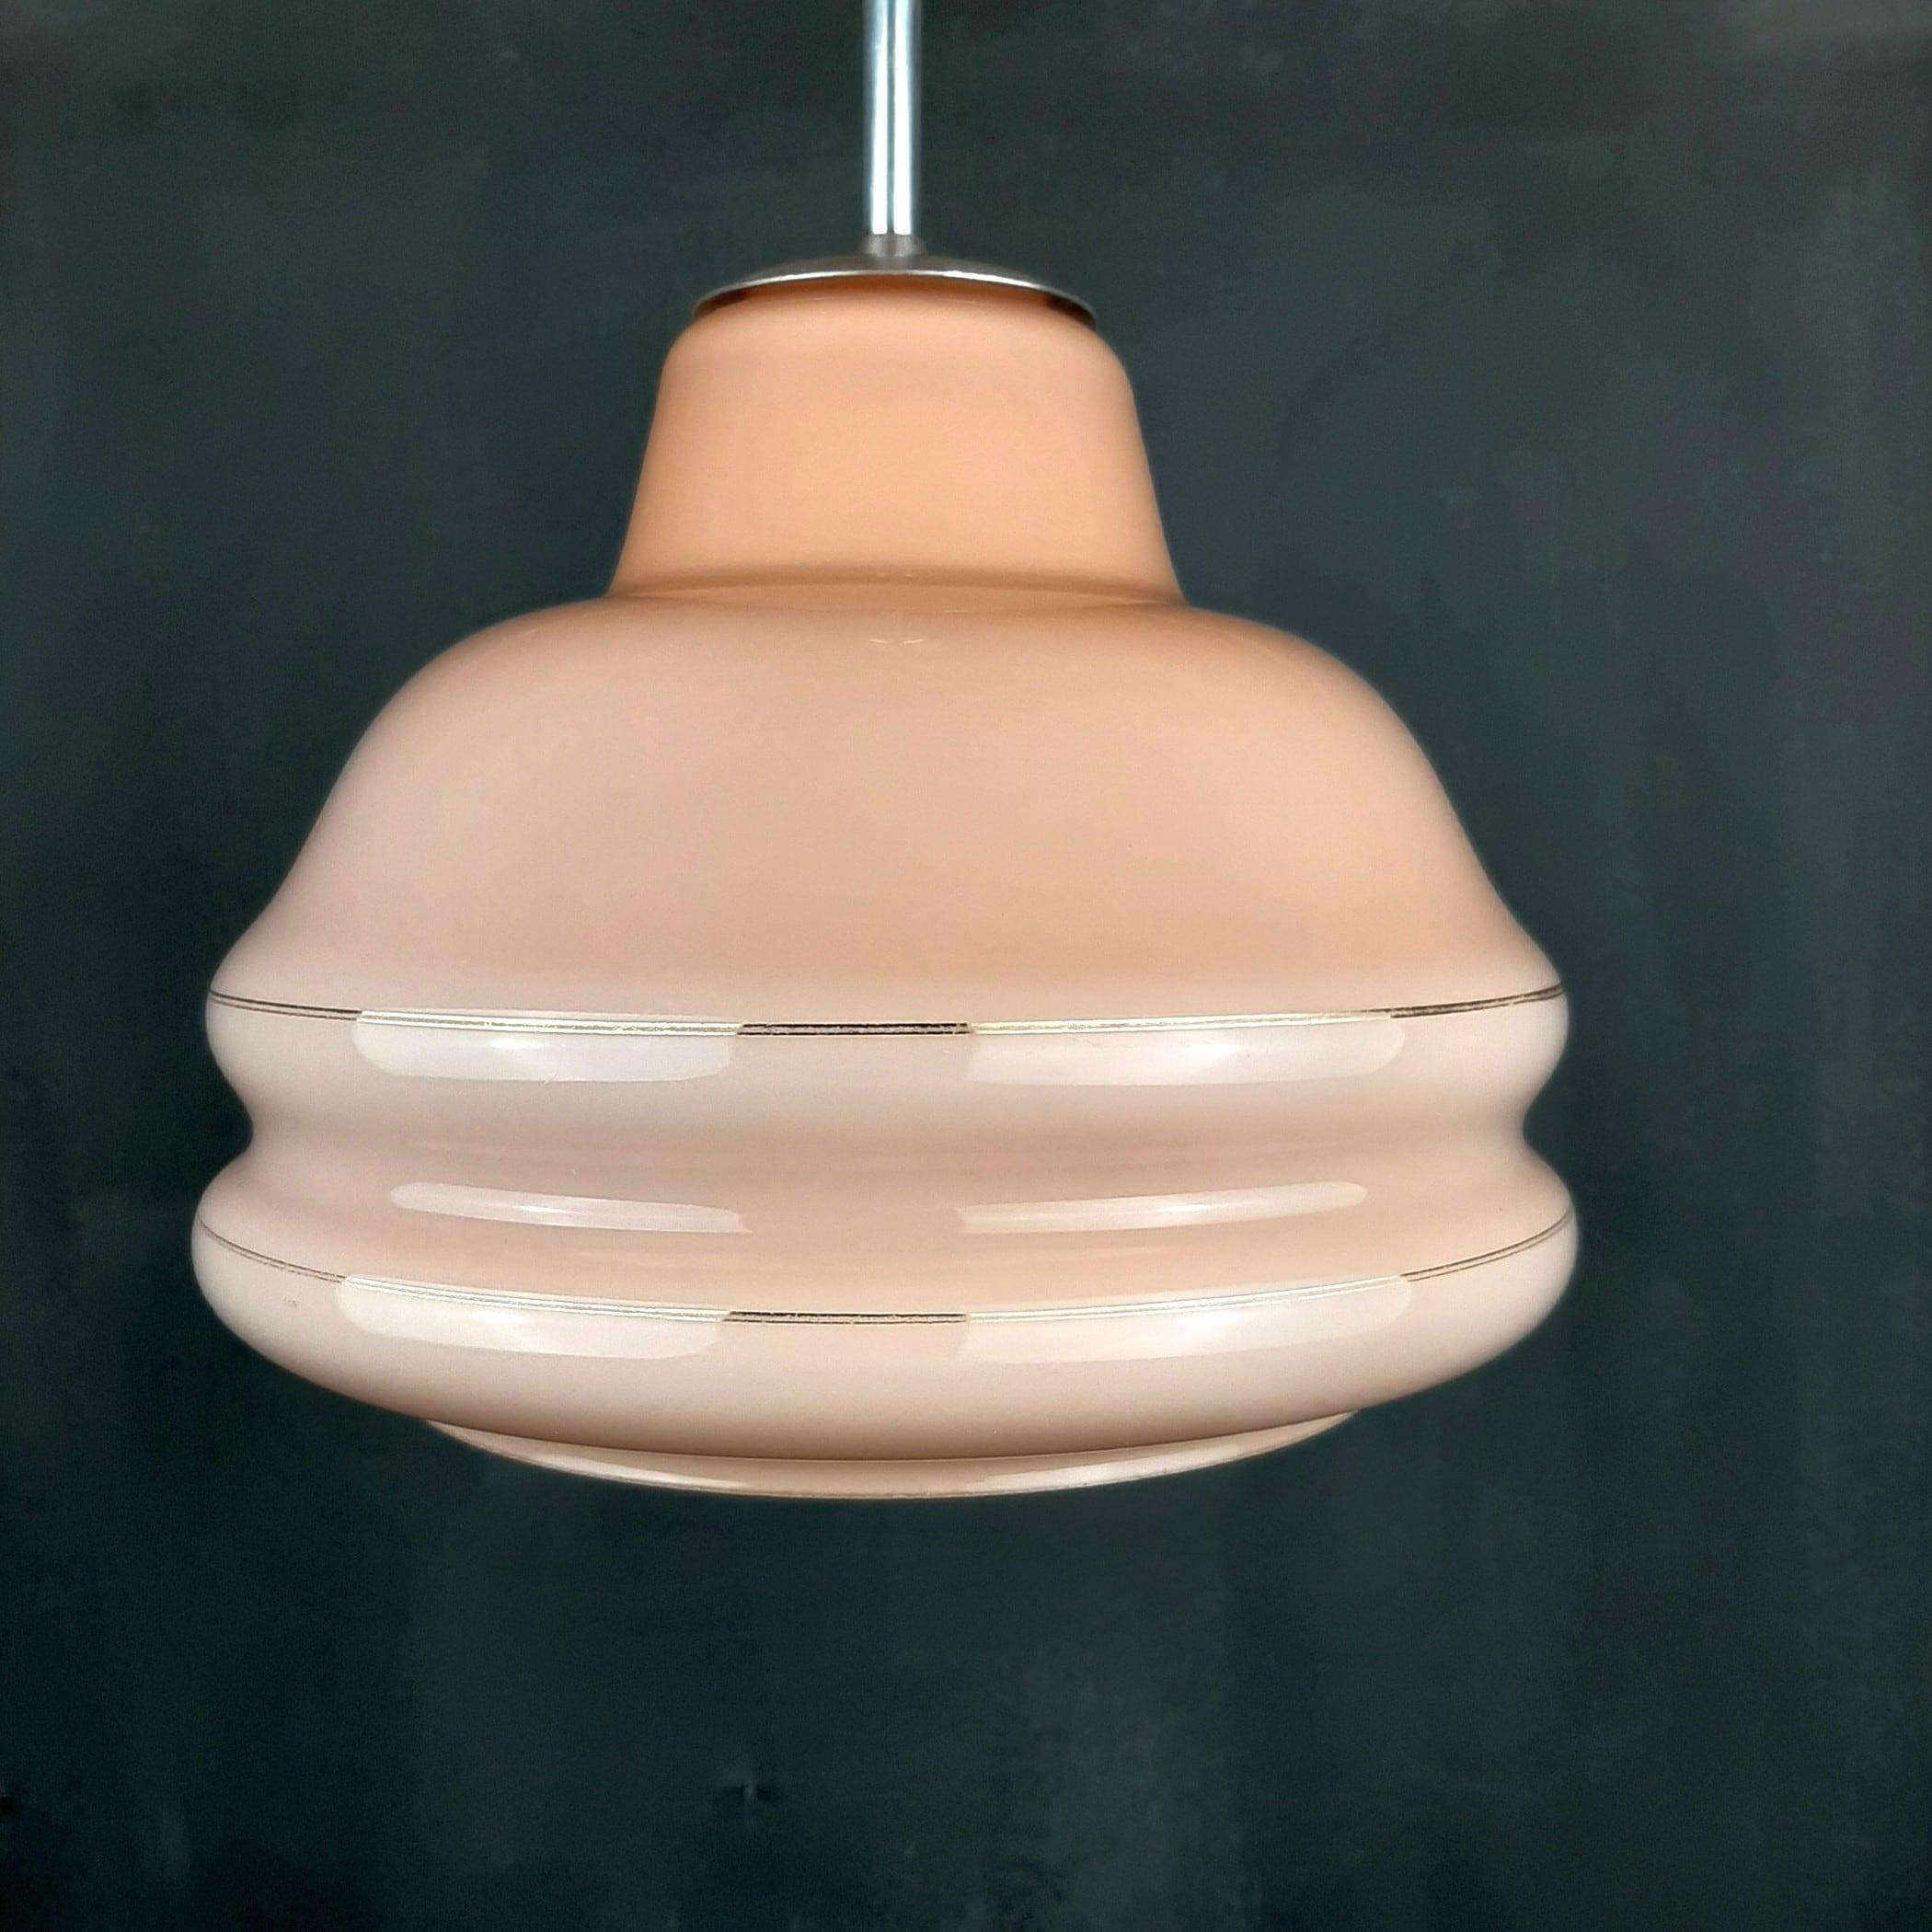 Vintage glass pendant lamp Yugoslavia 1960s